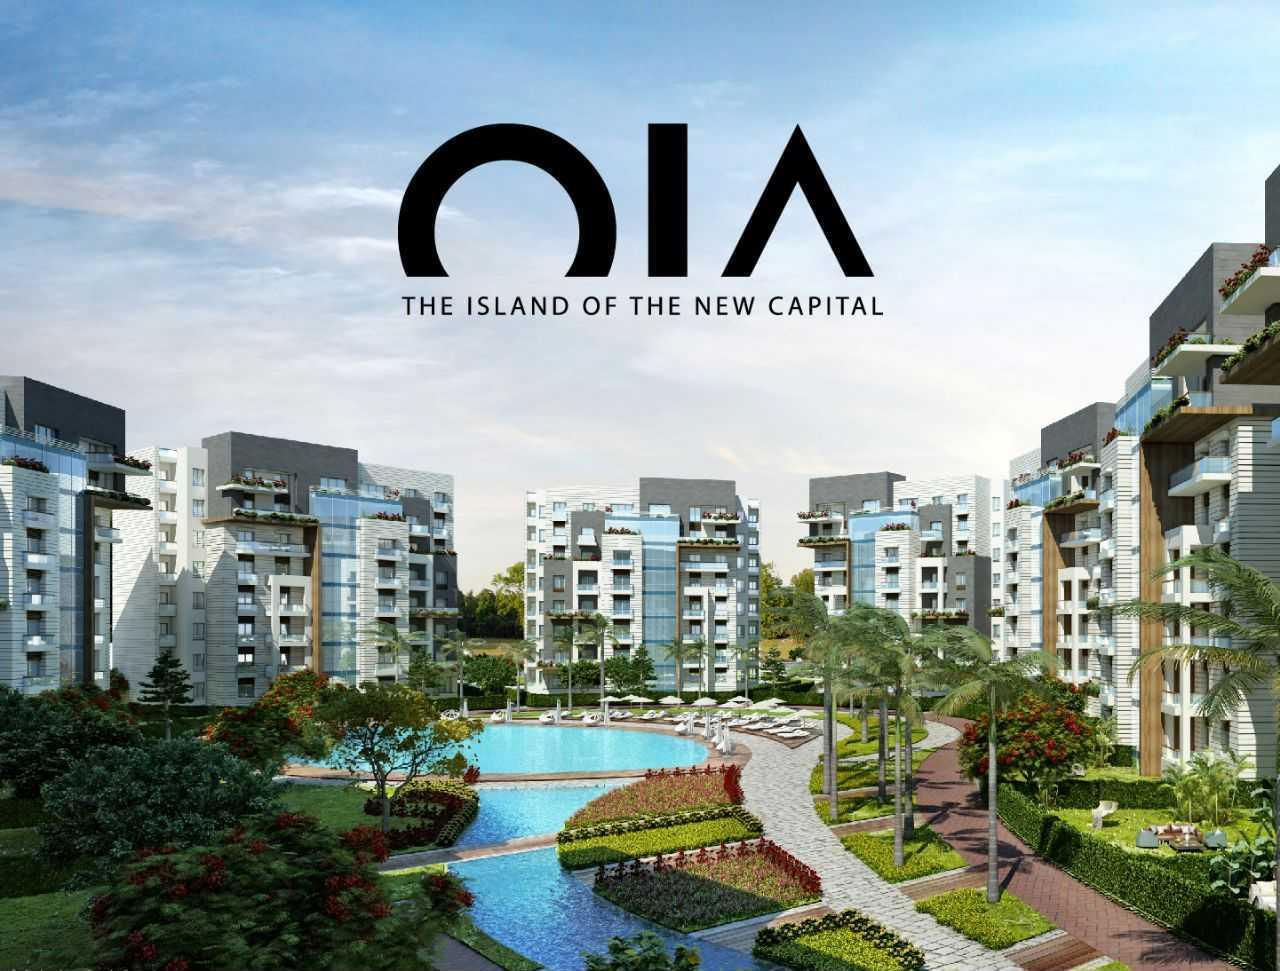 Oia New Capital Residences By Edge Holding-كمبوند-أويا-ايدج-العاصمة-الإدارية-الجديدة-شركة-إيدج-هولدينج